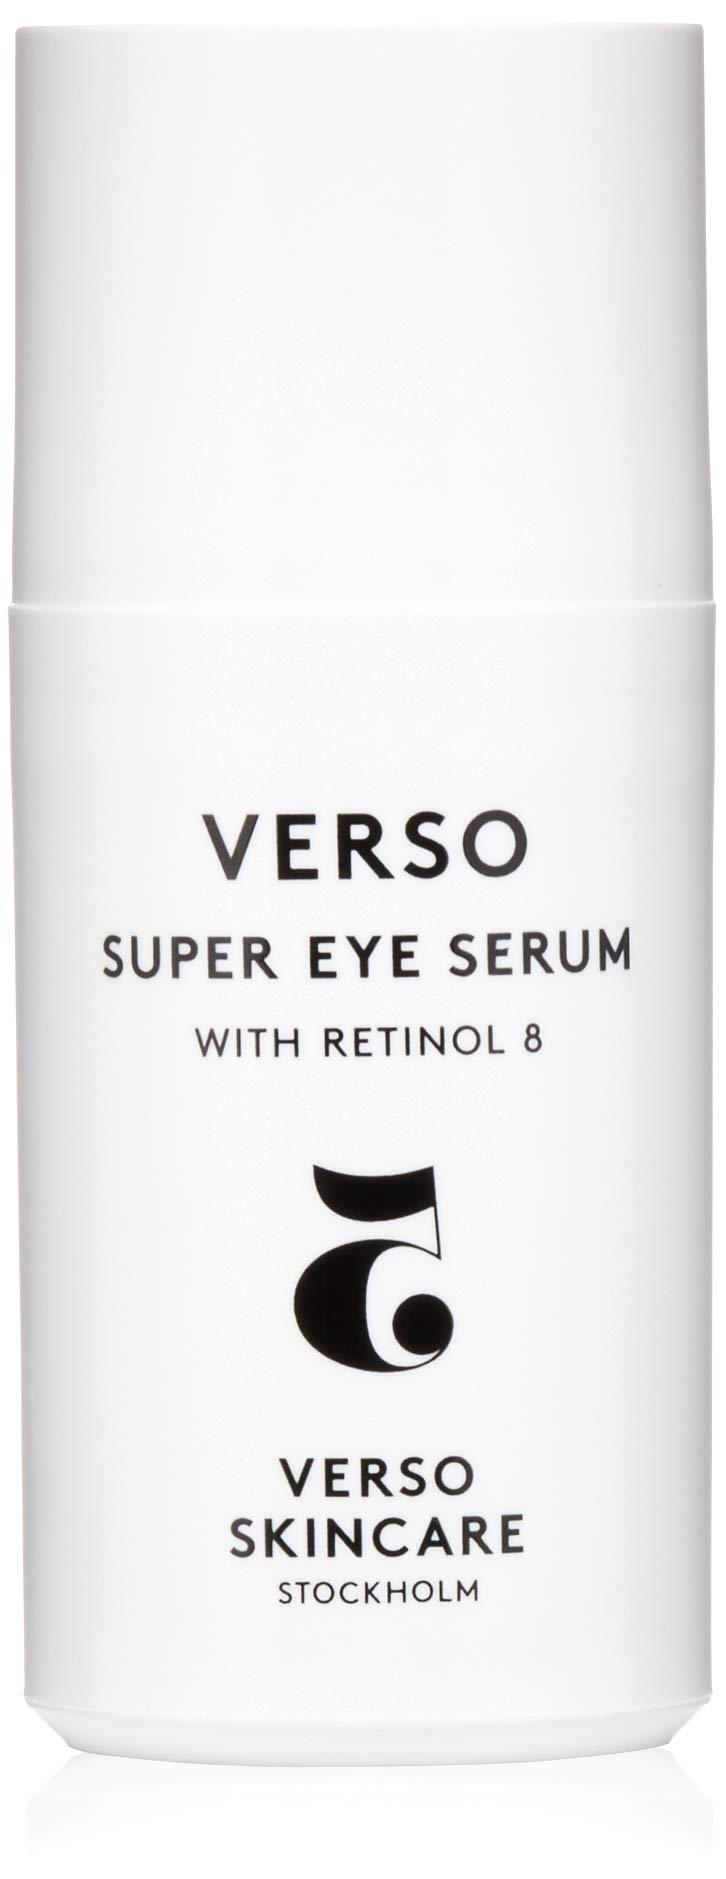 Verso Skincare Super Eye Serum 1 Oz